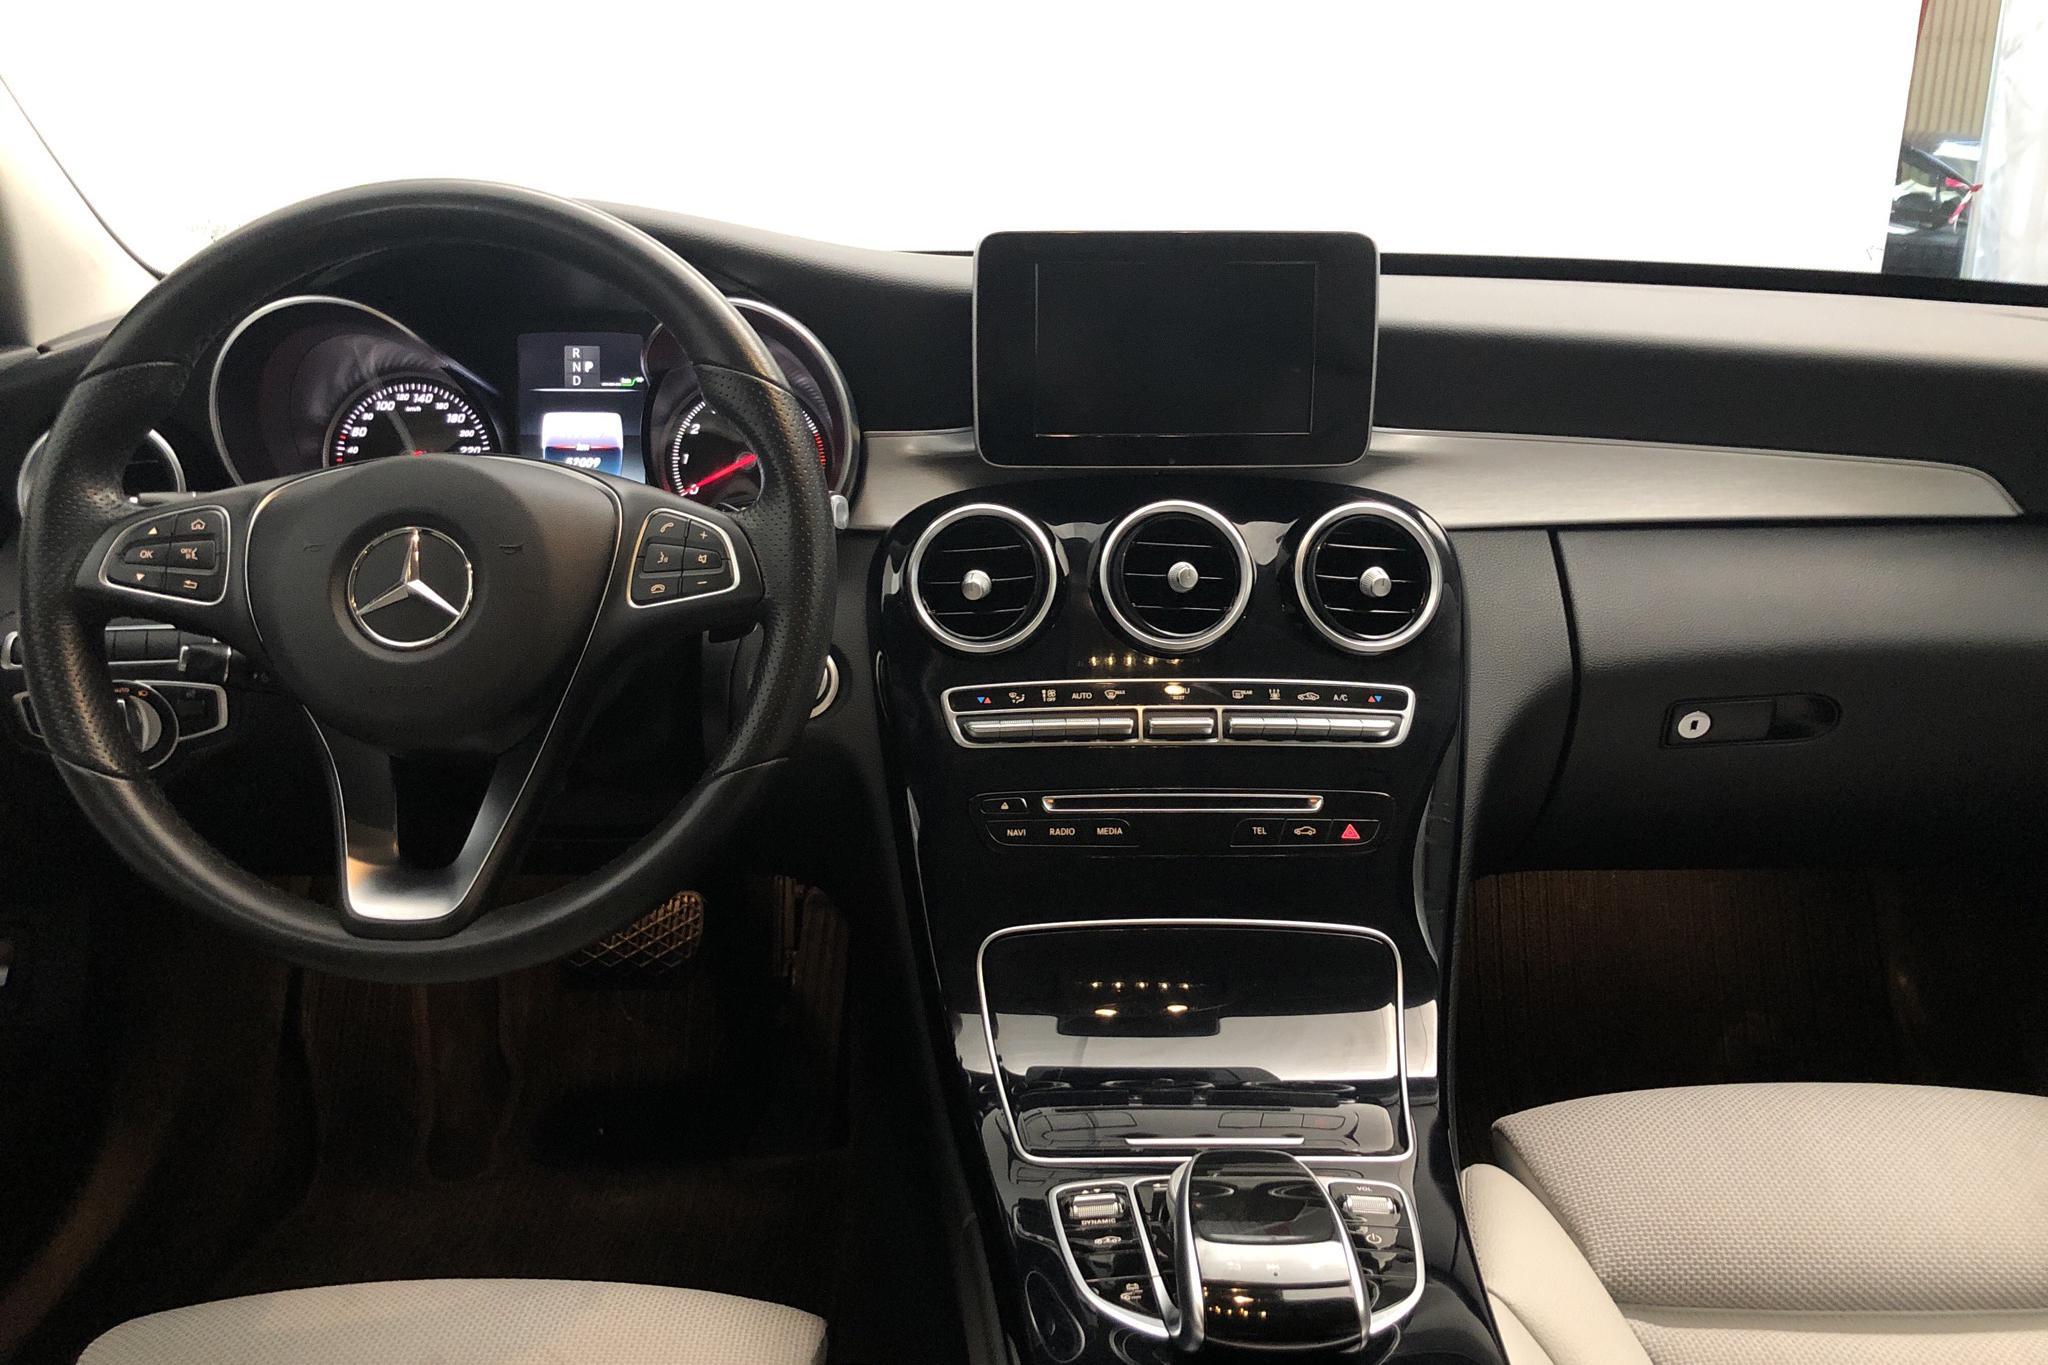 Mercedes C 350 e Kombi S205 (211hk) - 5 200 mil - Automat - grå - 2017